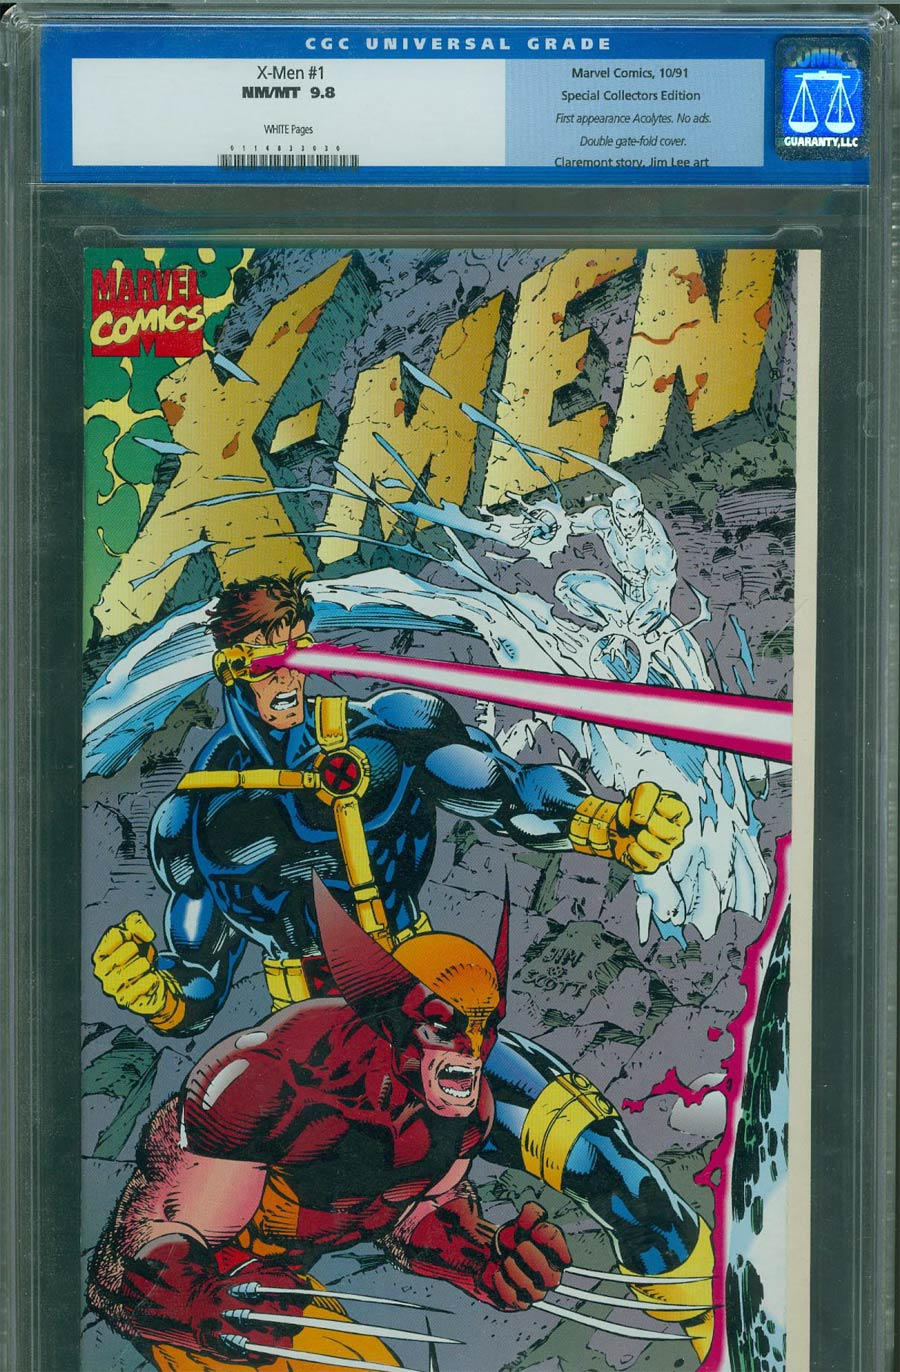 X-Men Vol 2 #1 Cover N Fold-Out CGC 9.8